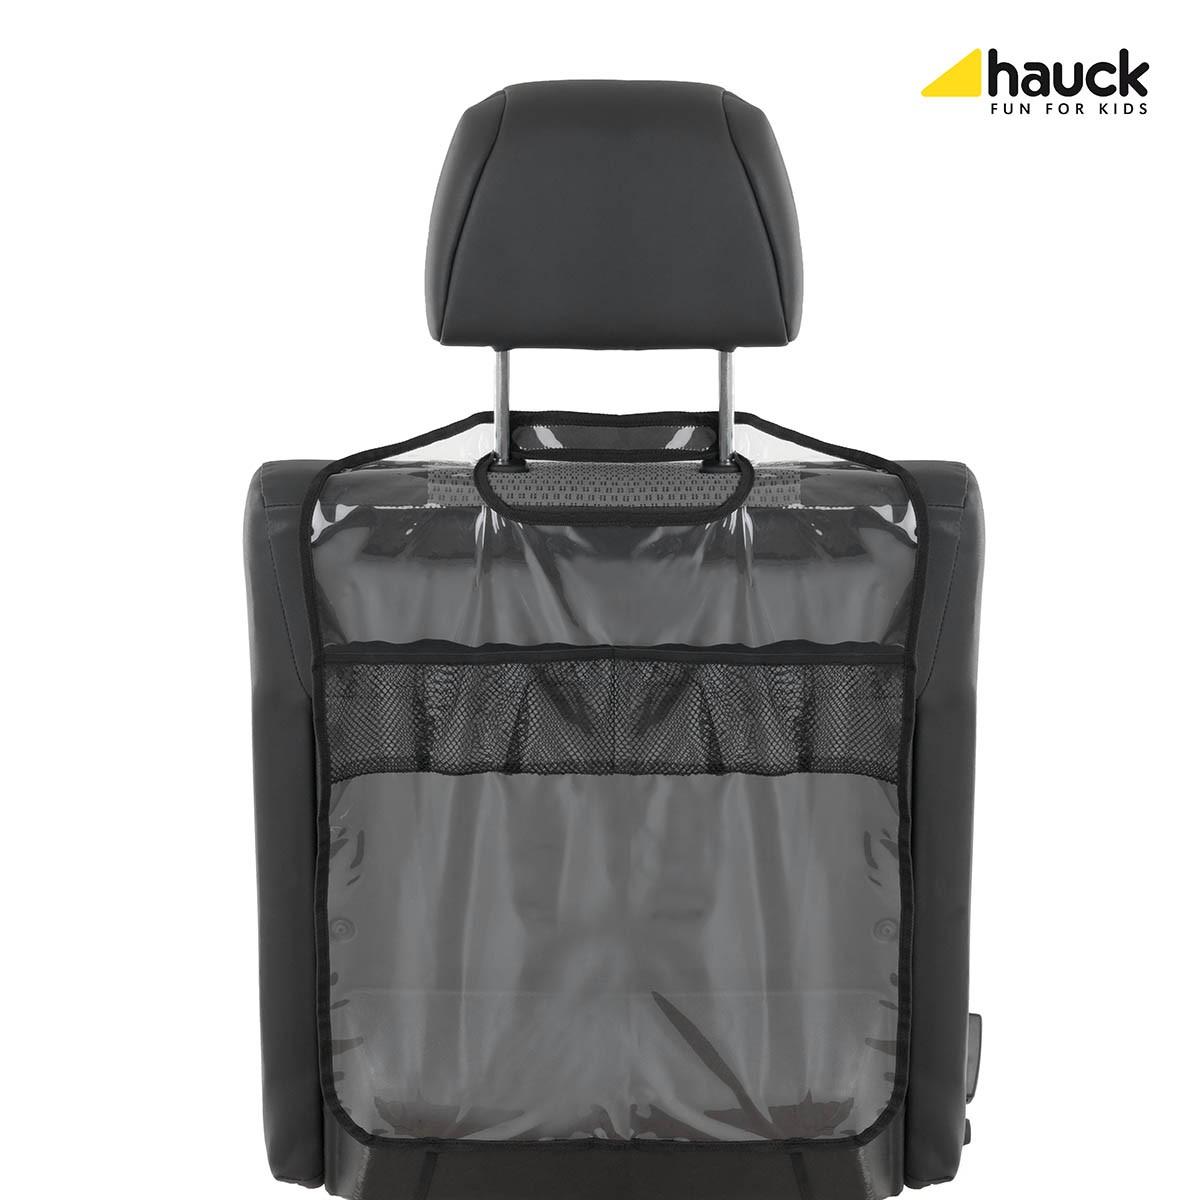 Hauck Organiseur Cover Me